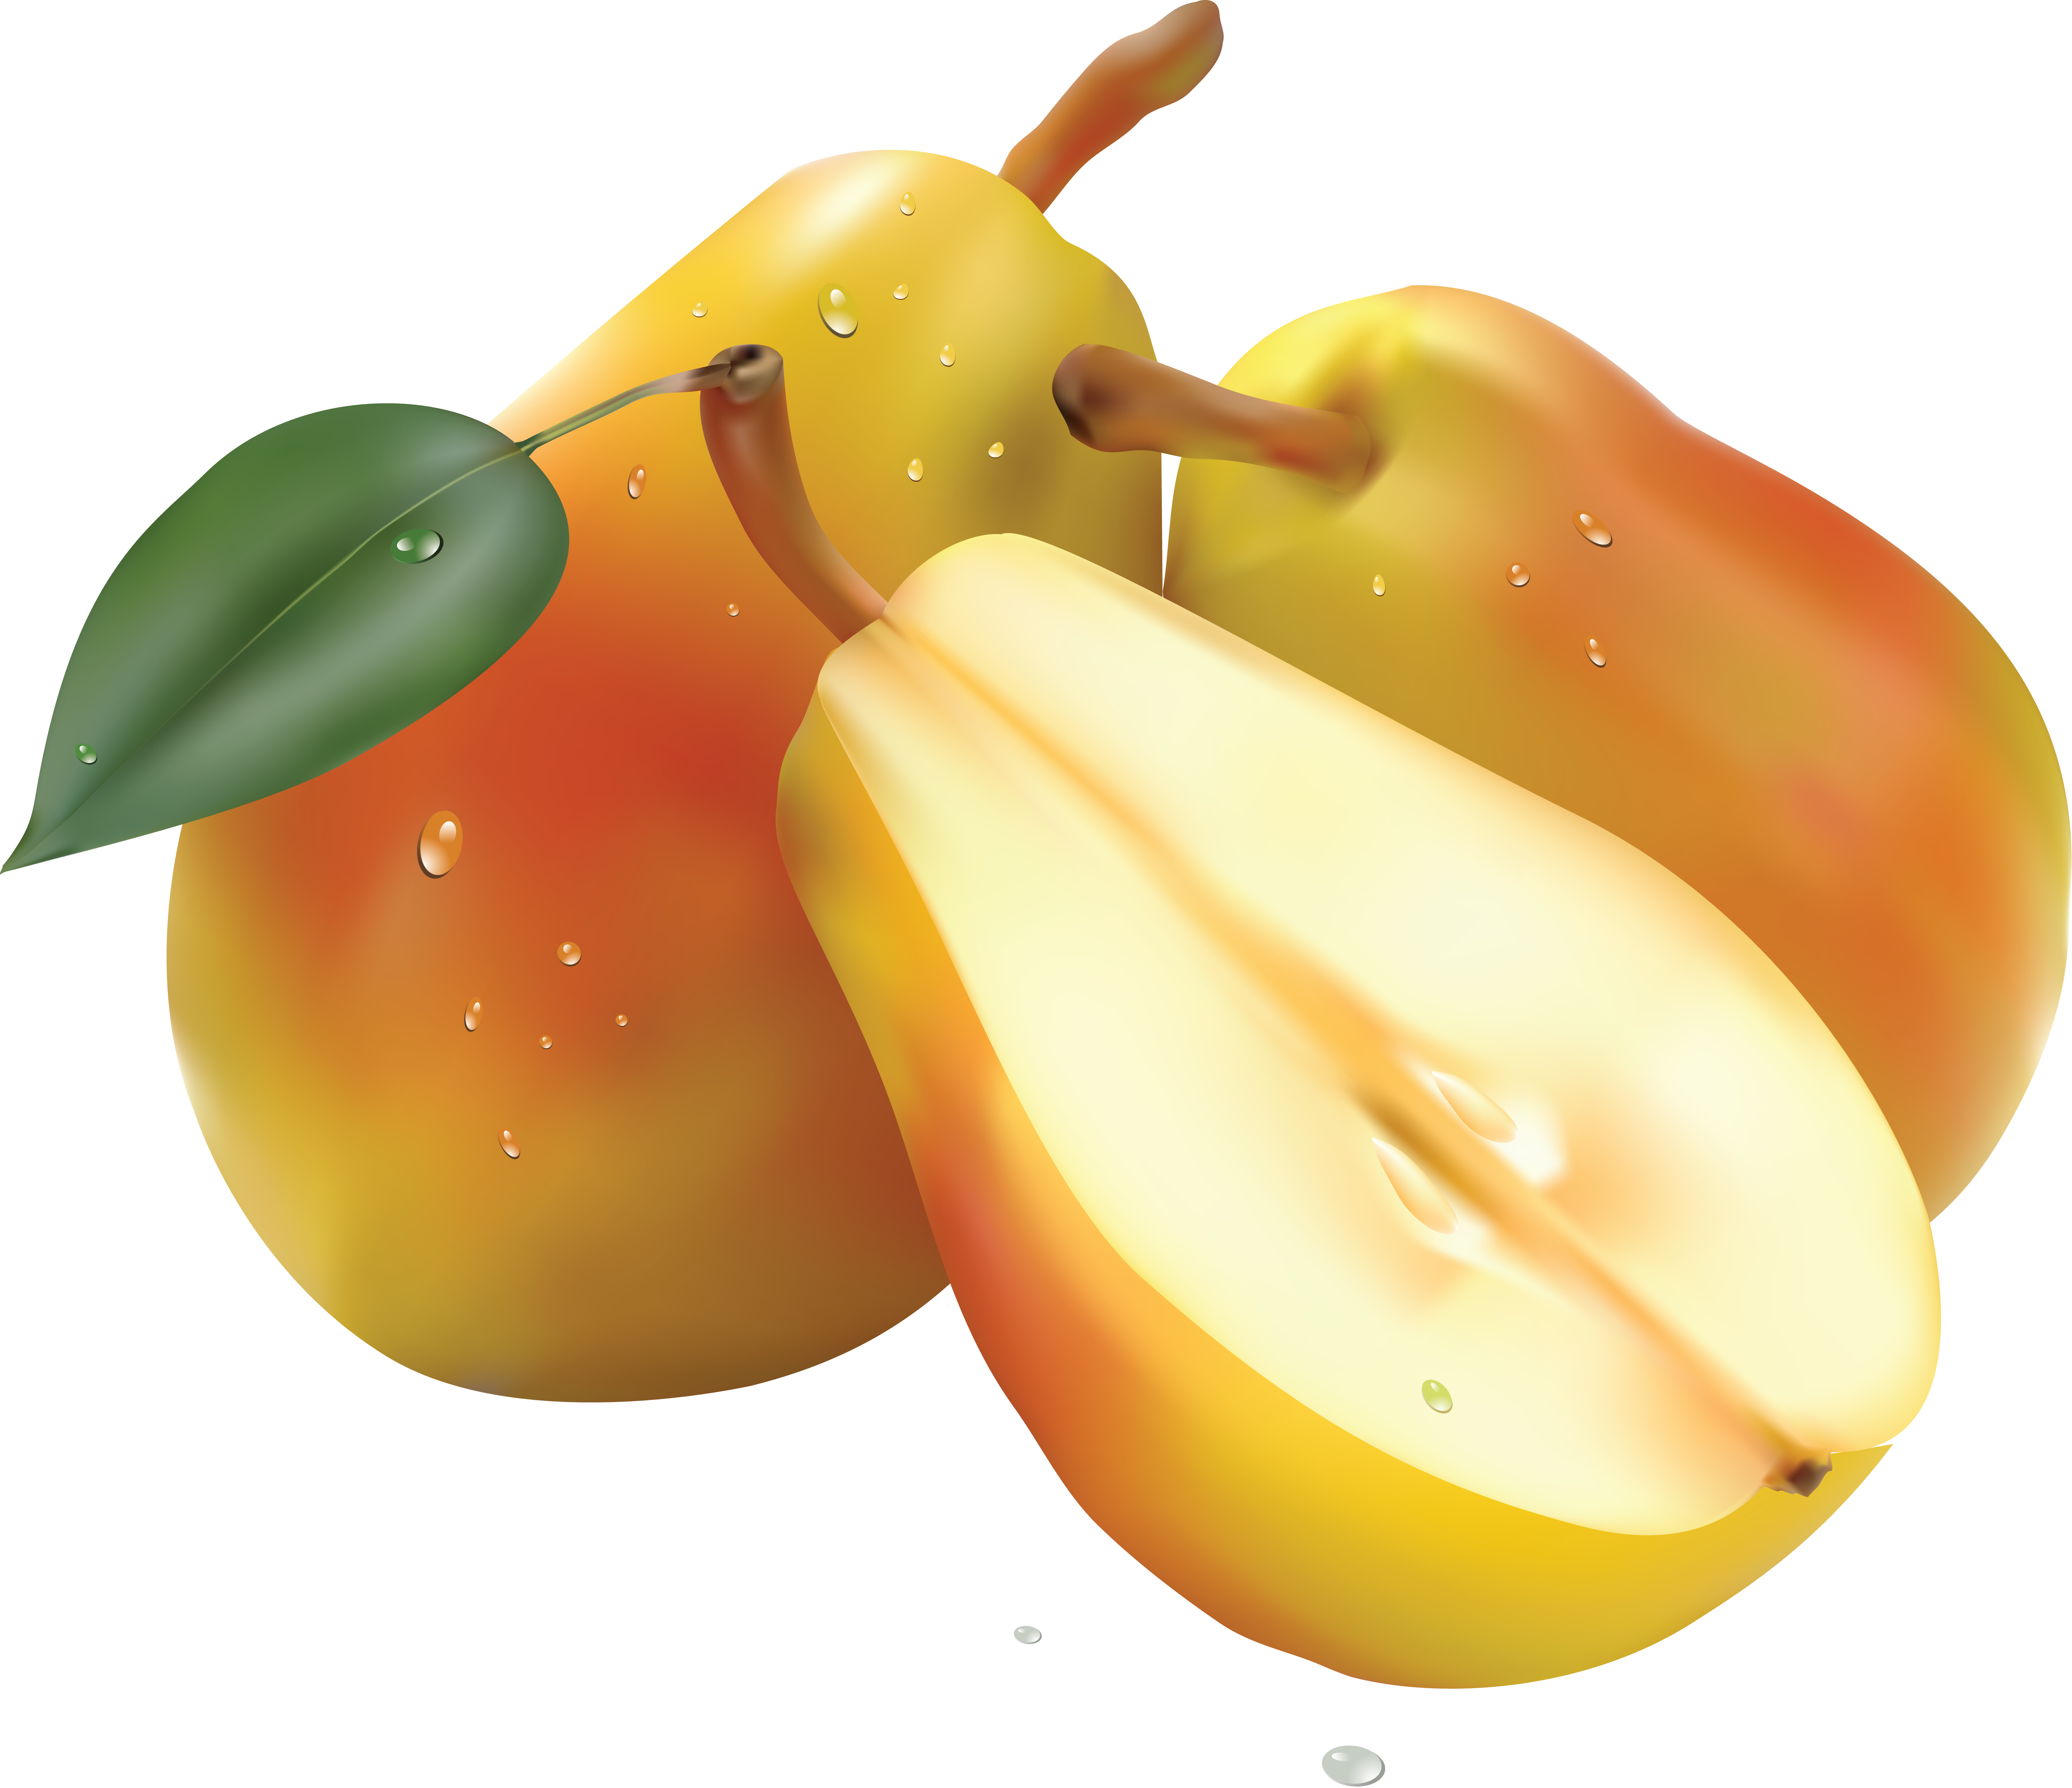 Pear PNG Image - PurePNG | Free transparent CC0 PNG Image ...